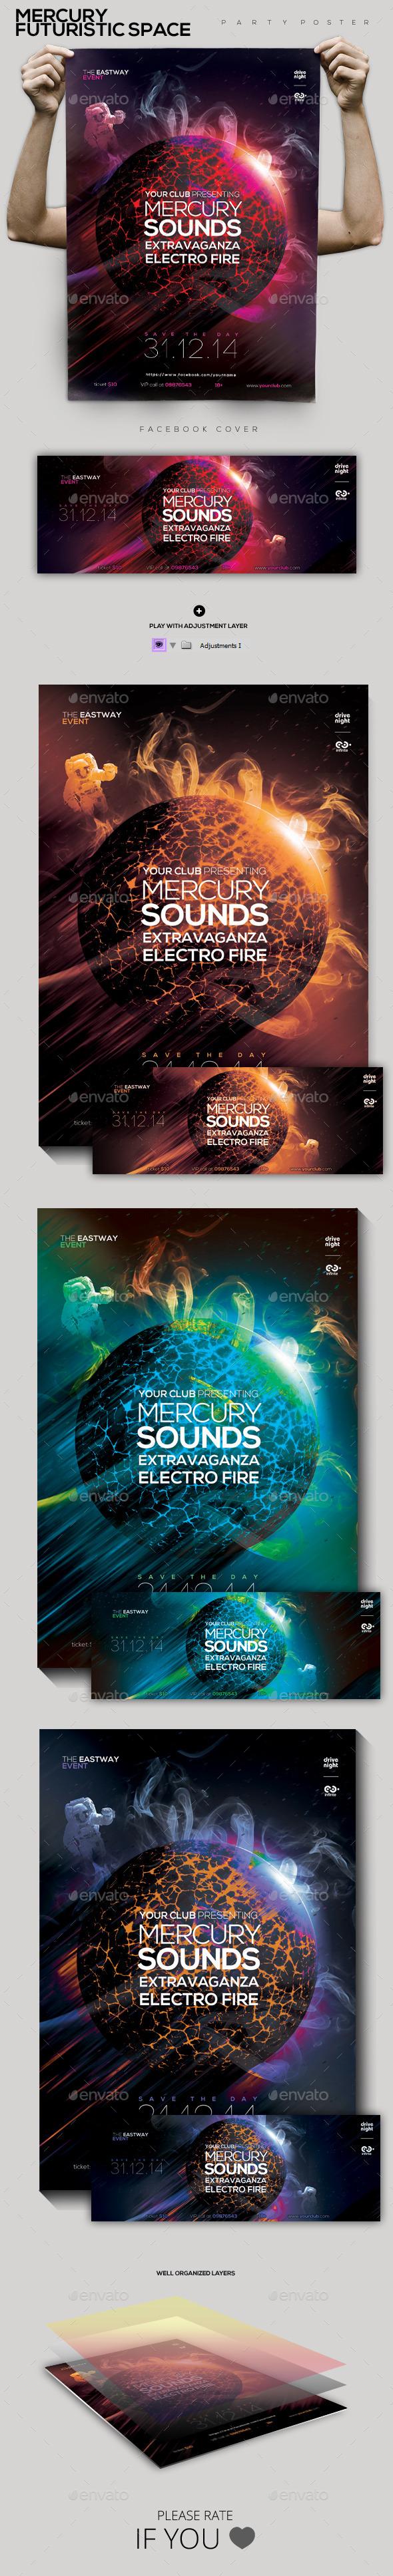 GraphicRiver Mercury Futuristic Space Party Flyer Poster 9860008